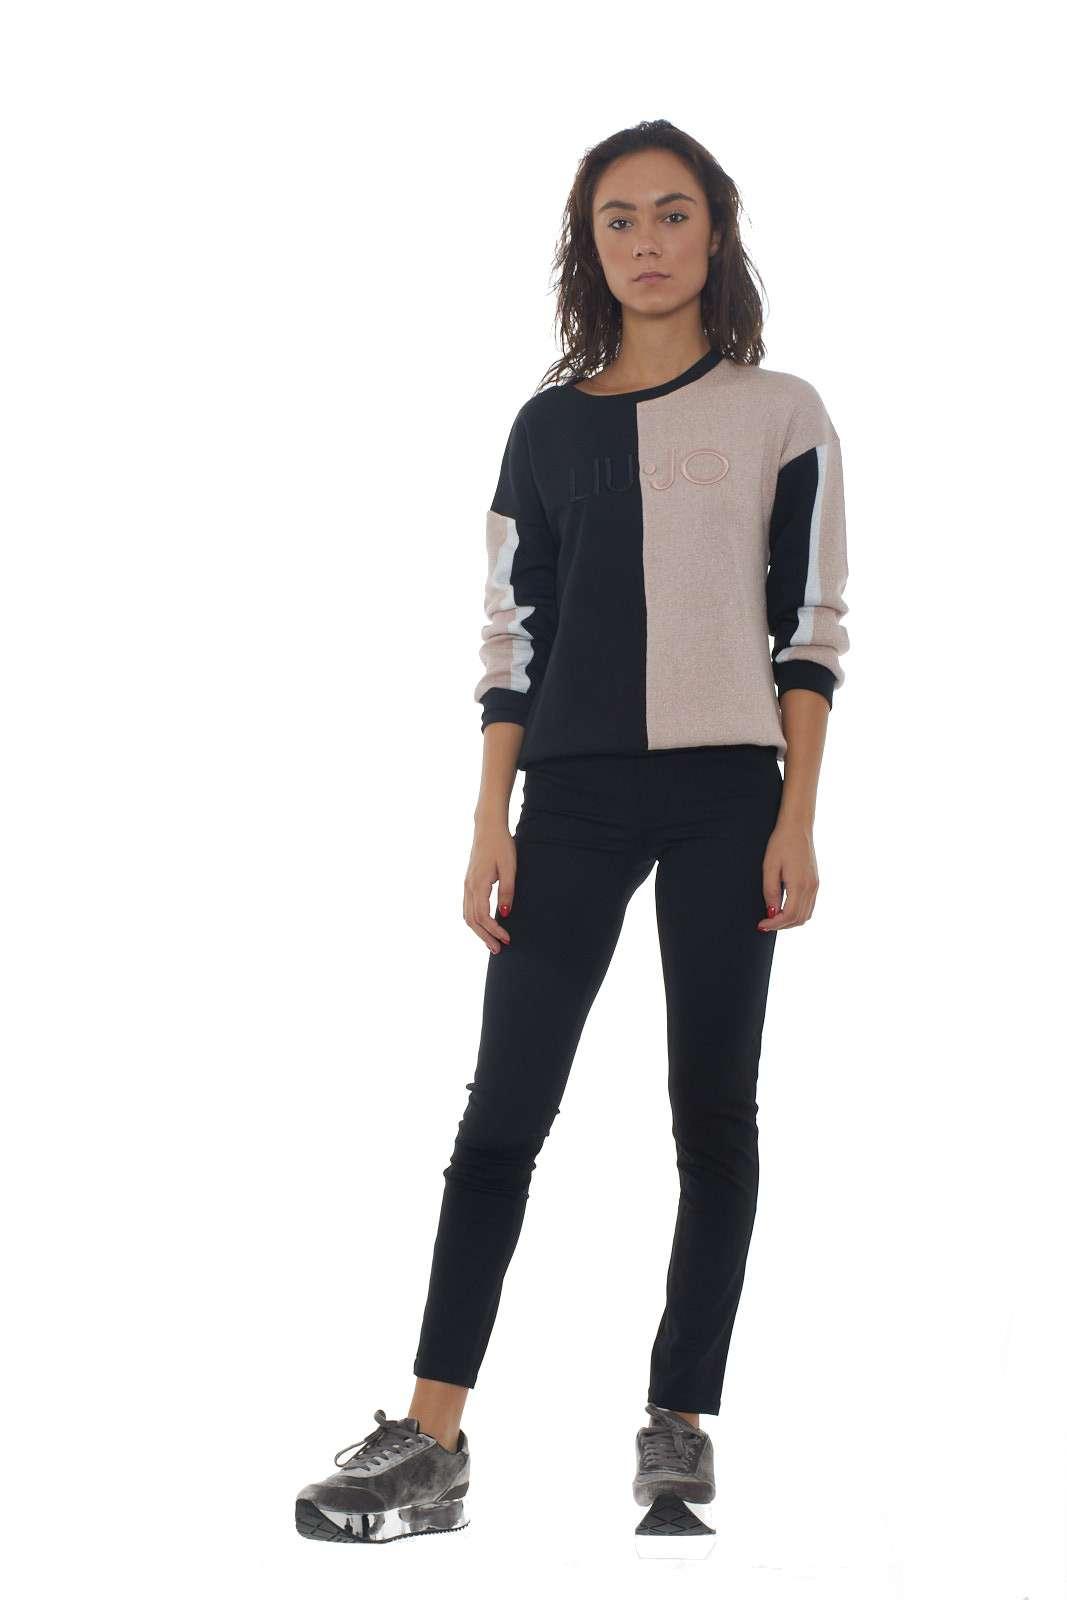 https://www.parmax.com/media/catalog/product/a/i/AI-outlet_parmax-pantaloni-donna-Liu-Jo-T69033-D.jpg